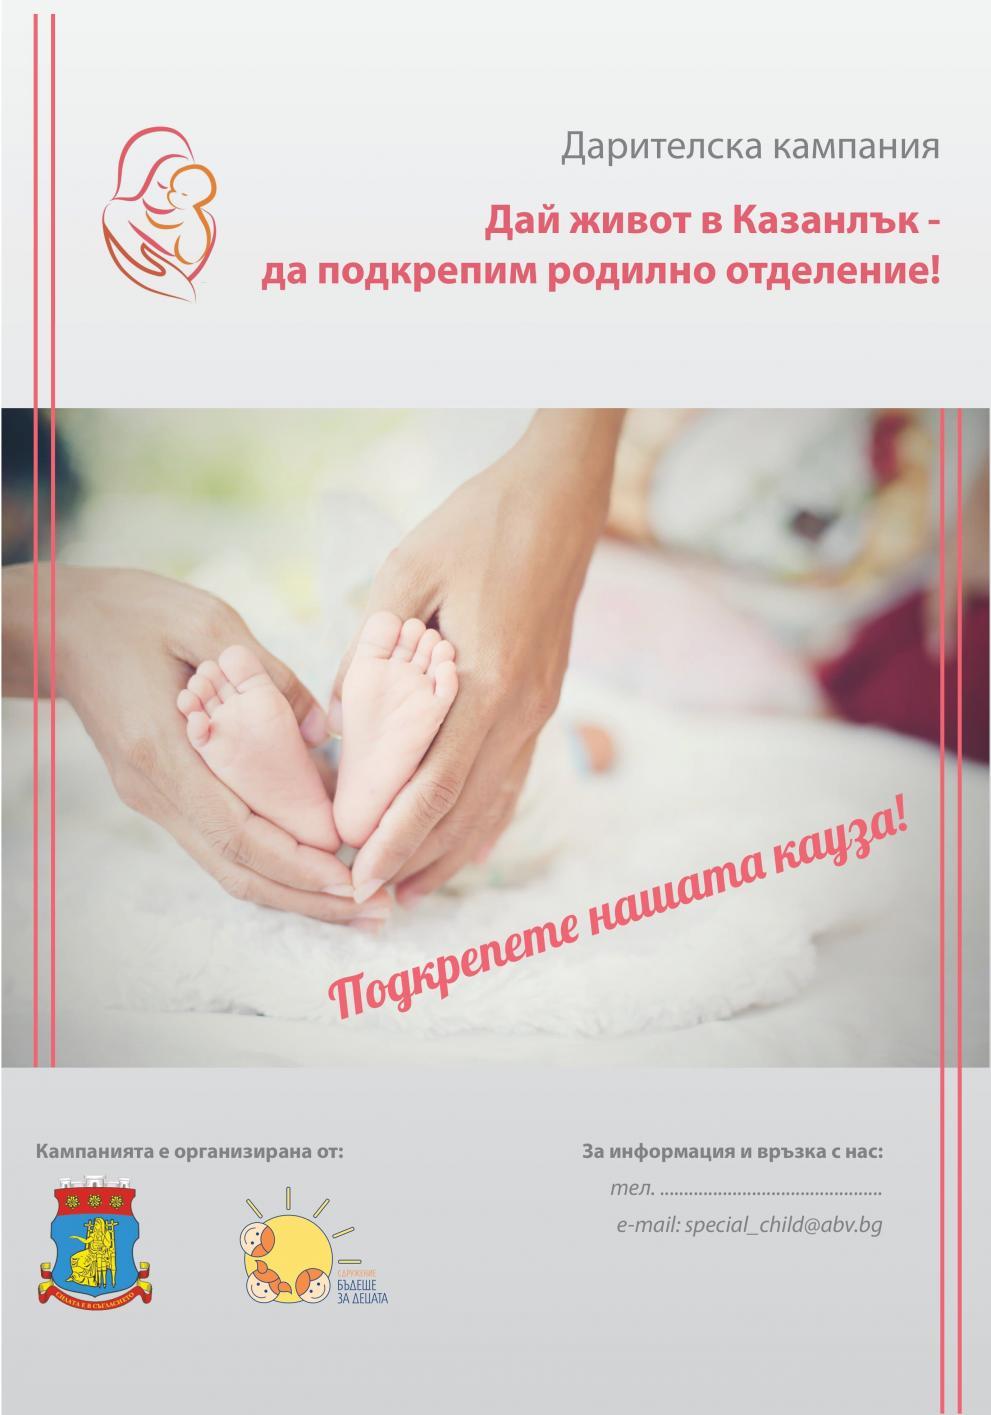 daritelska-kampaniia